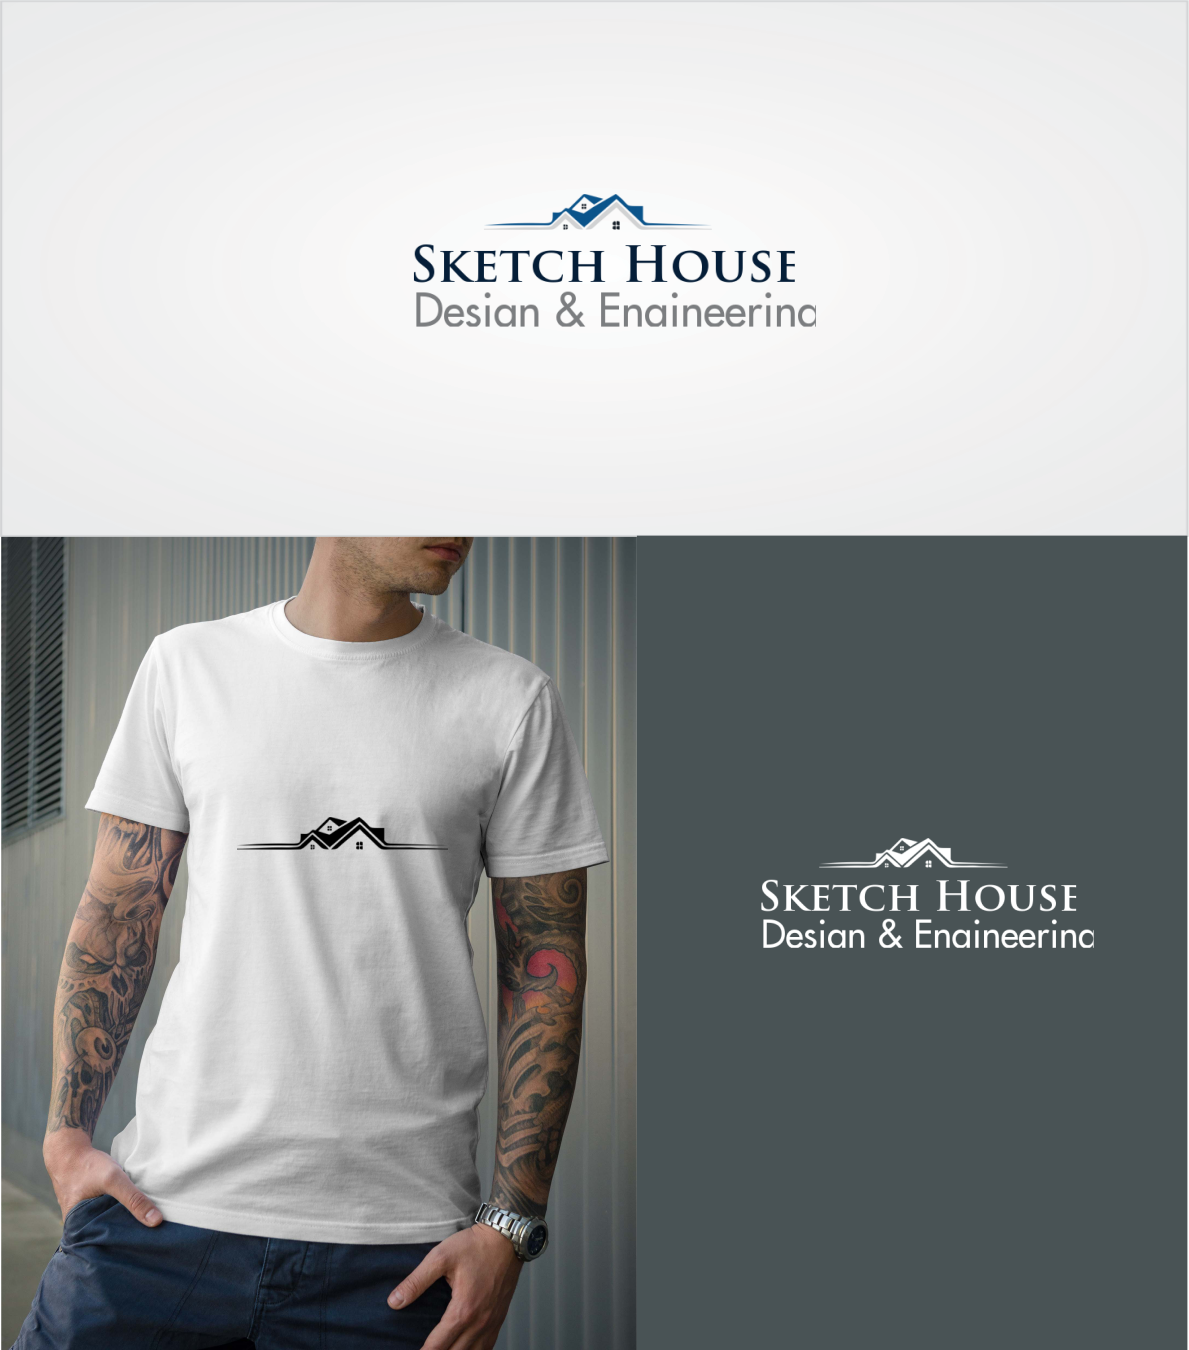 85ded956ba51e Bold, Serious, Architecture Logo Design for Sketch House (Design ...